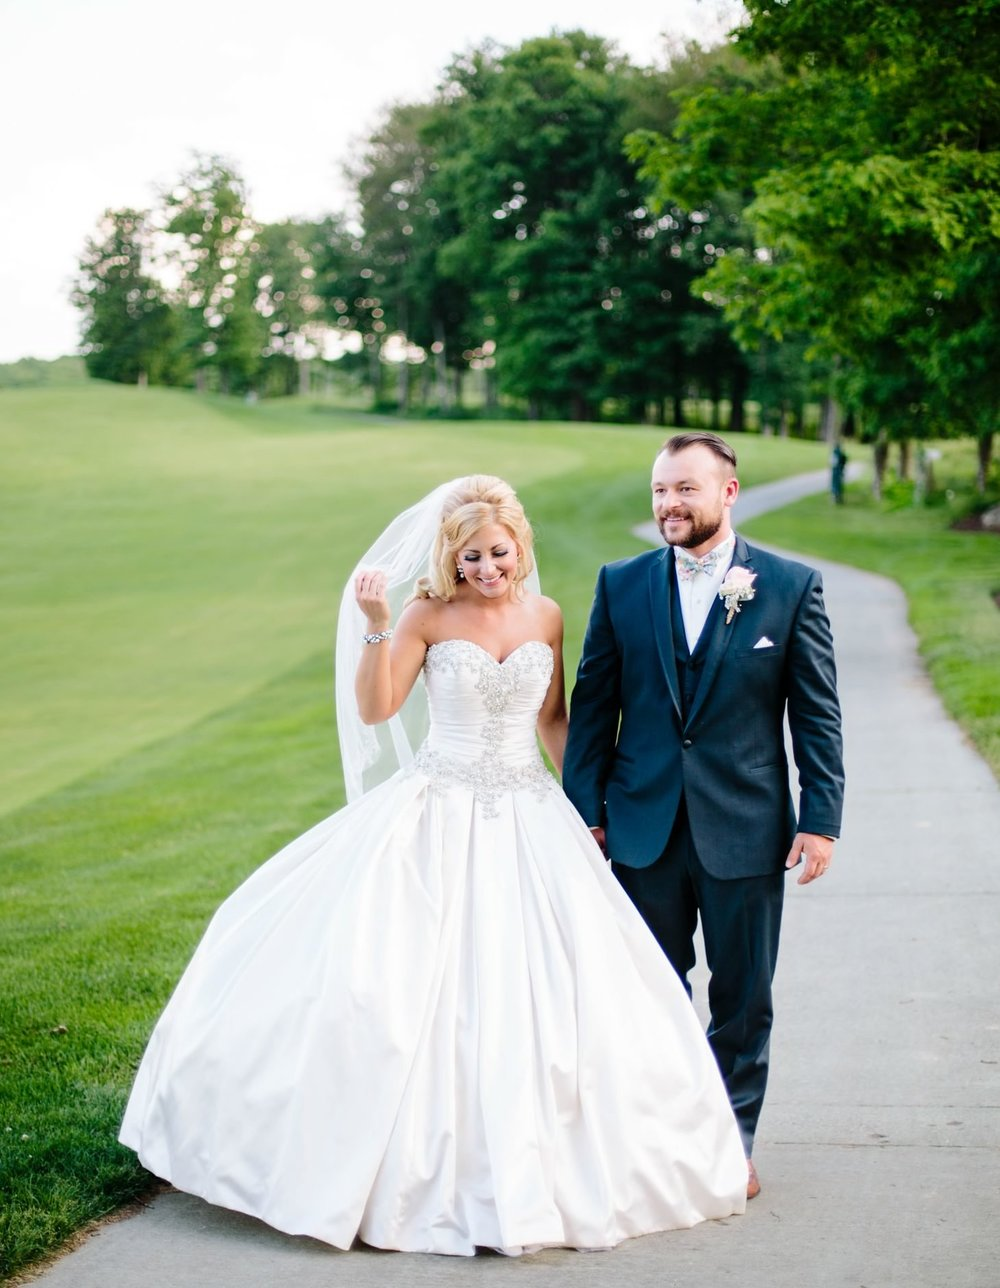 038-nyc-wedding-photographer-pa-nemacolin-smitten-chickens.jpg